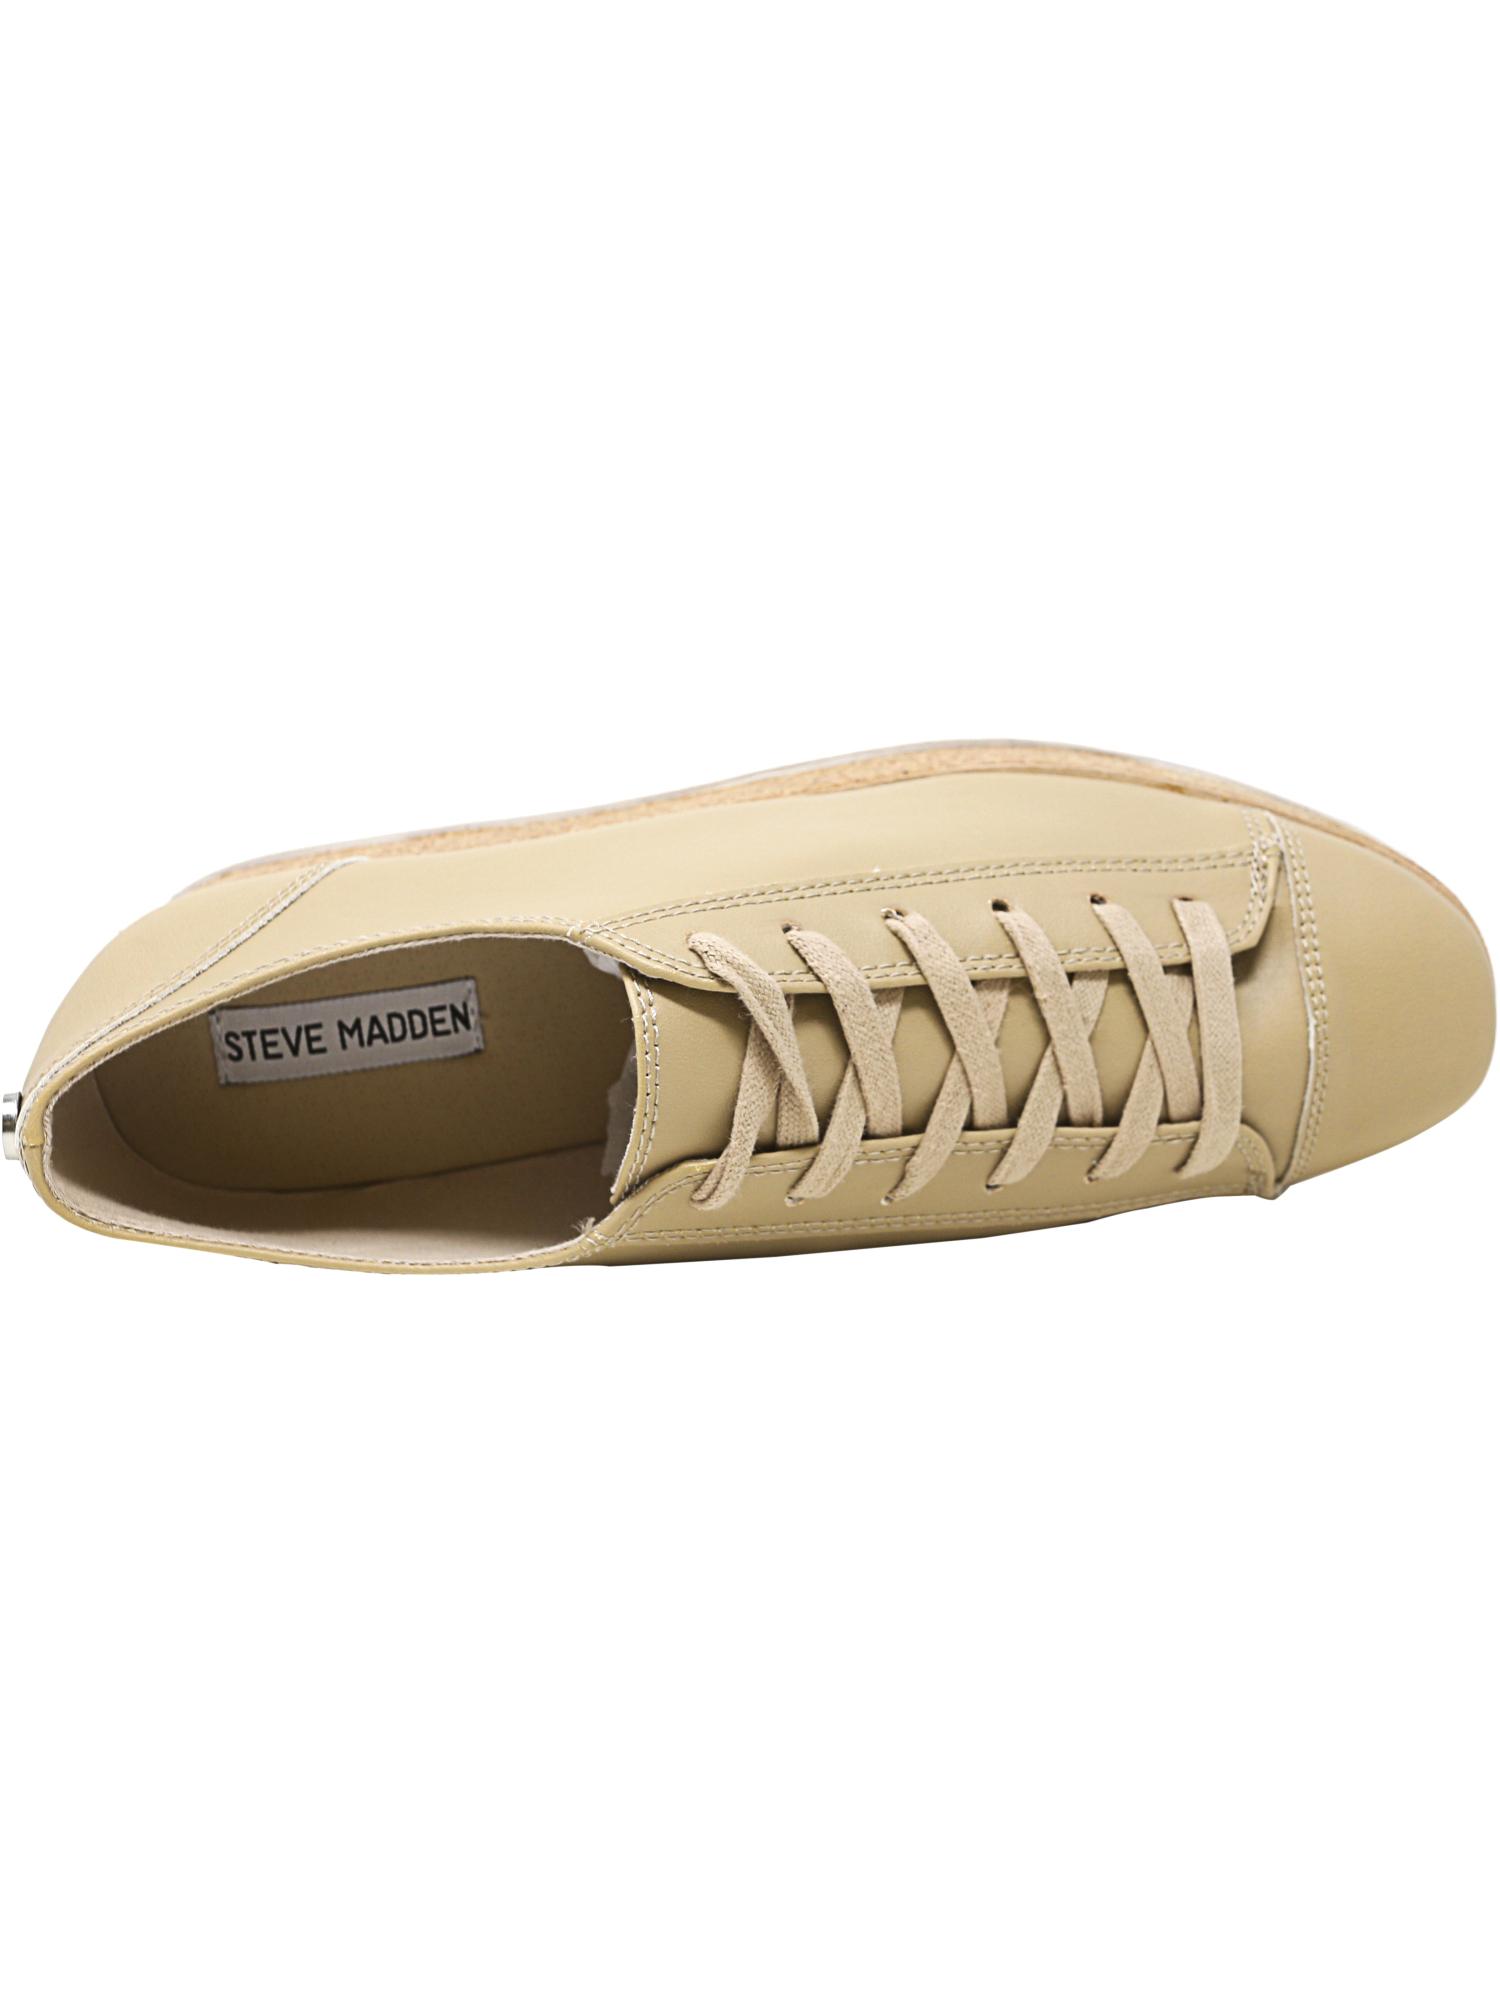 013bdd56112 Steve Madden Women s Kelani Ankle-High Fashion Sneaker